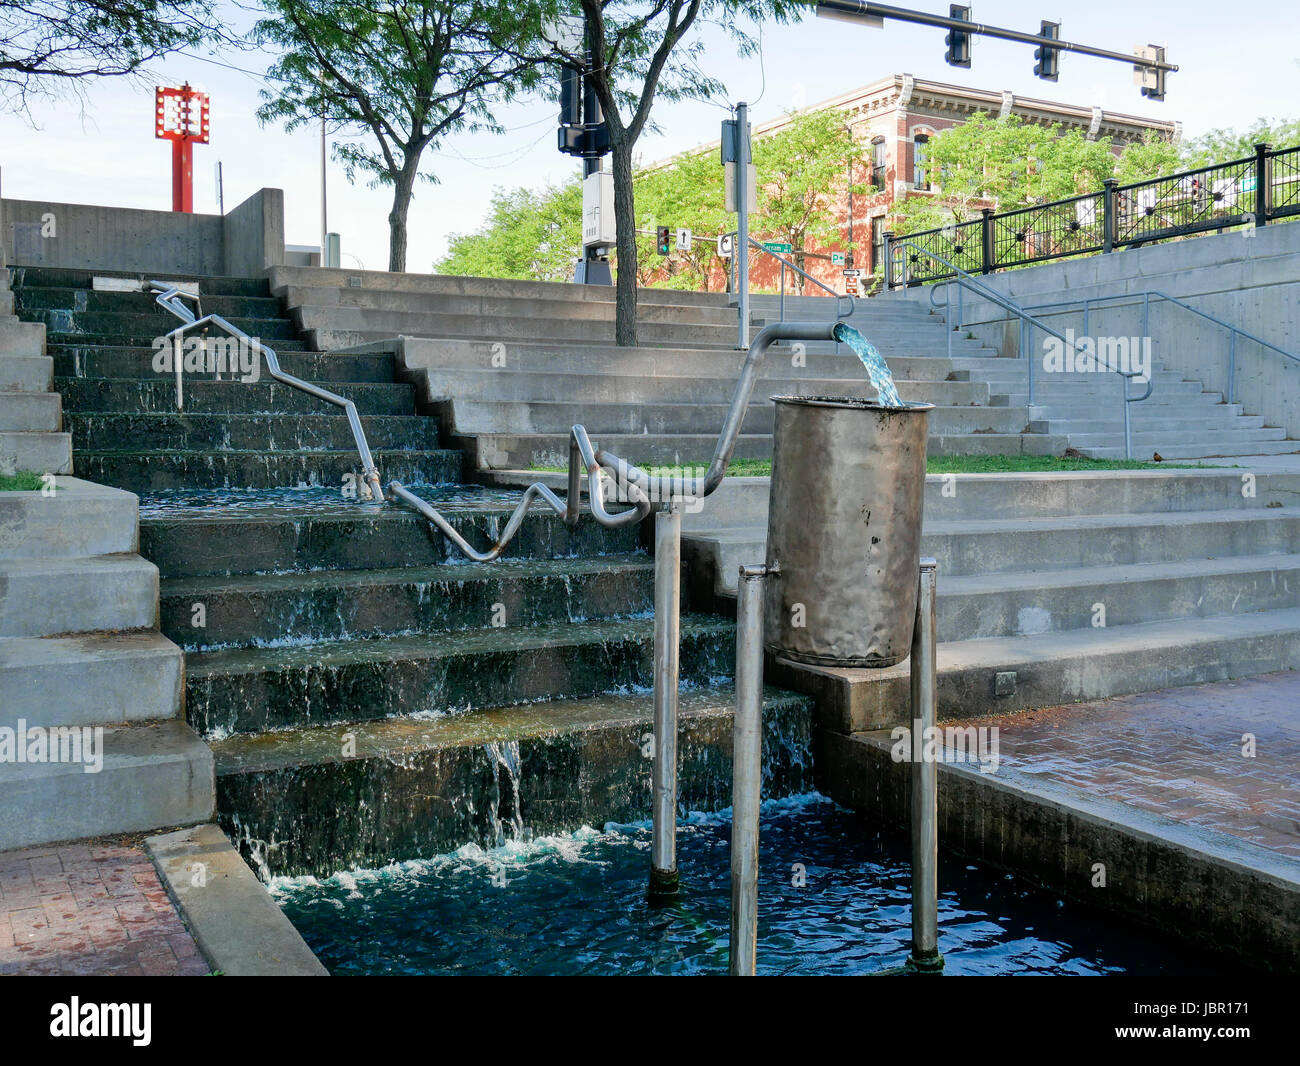 Water sculpture, Gene Leahy Mall, Omaha, Nebraska. Stock Photo